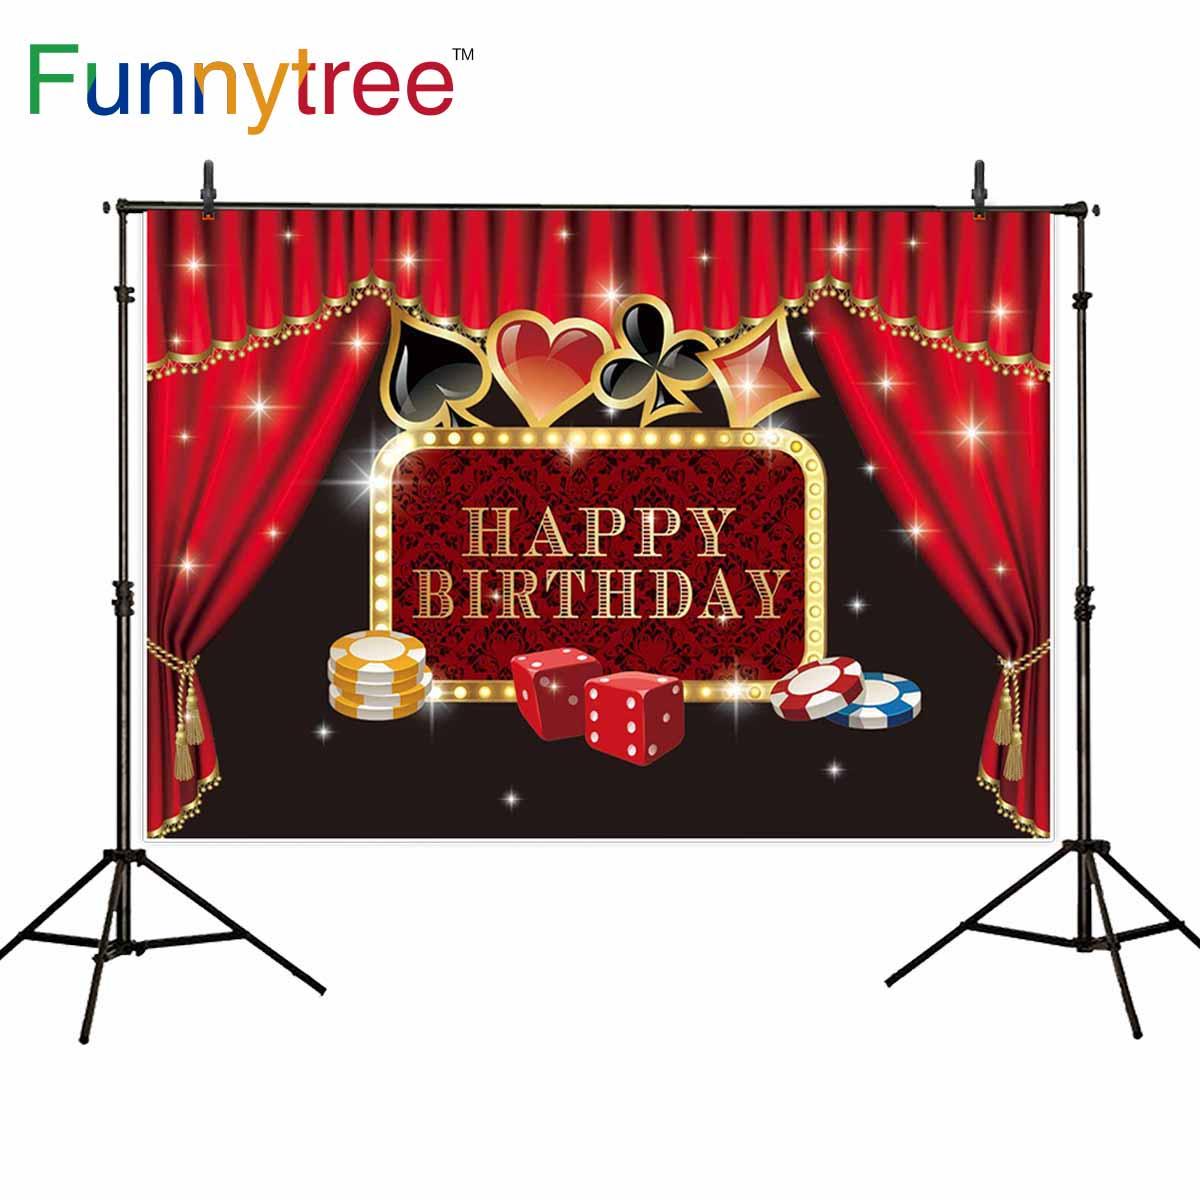 Funnytree foto de fondo photozone telón de fondo Casino Fiesta póker Las Vegas cumpleaños tema cortina fotografía estudio fotofono